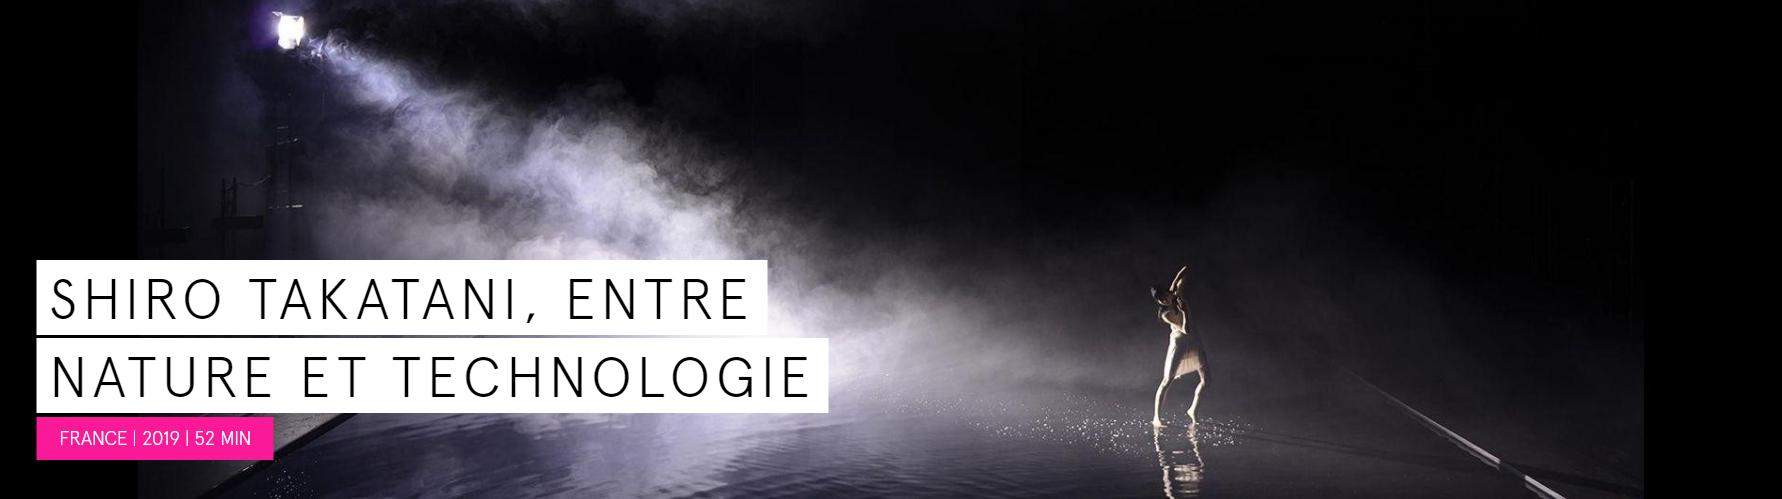 FIFA – Shiro Takatani, entre nature et technologie